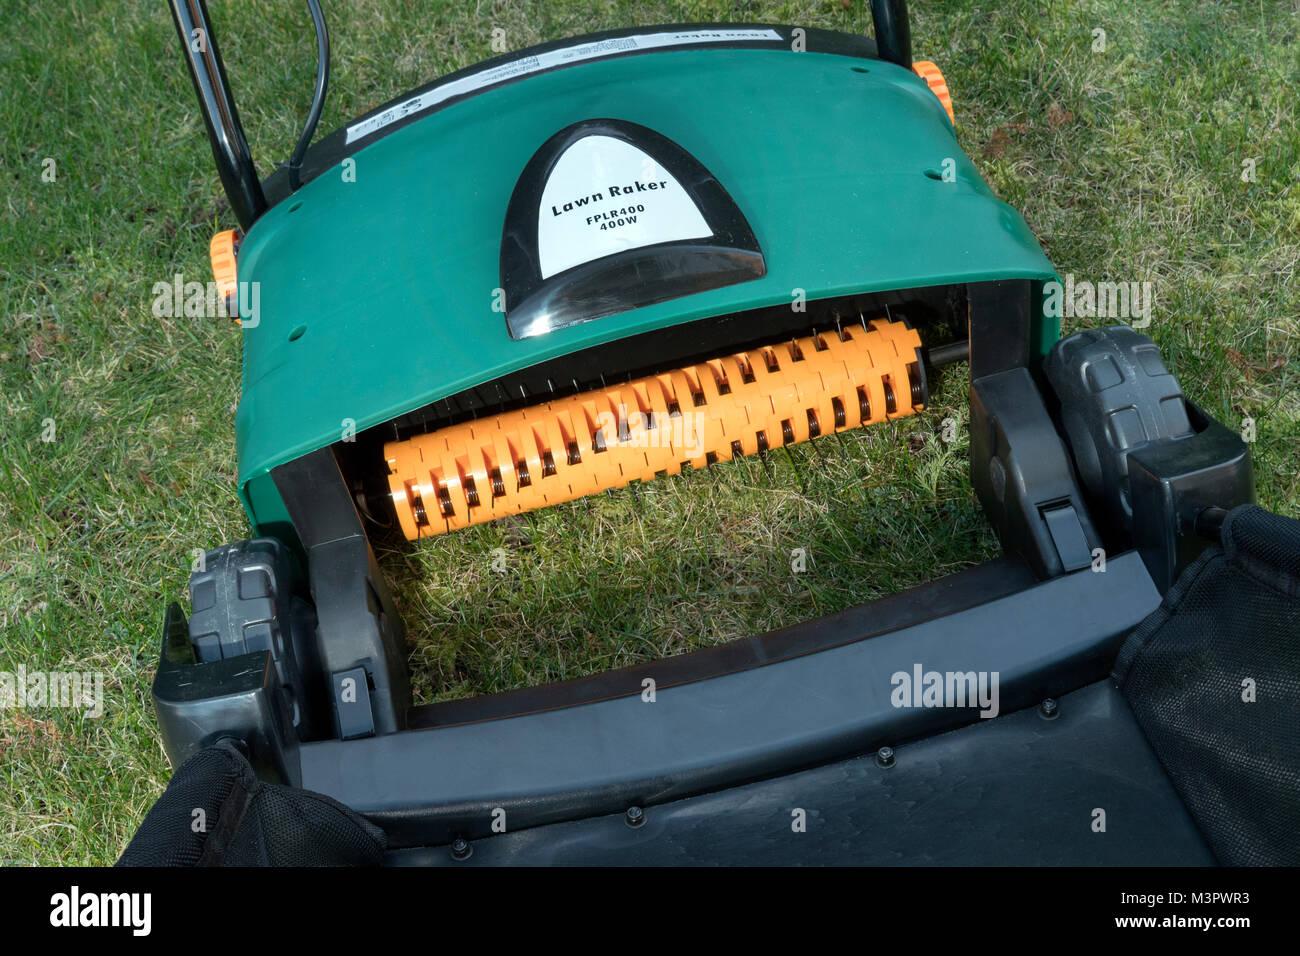 Electric garden lawn raker - Stock Image